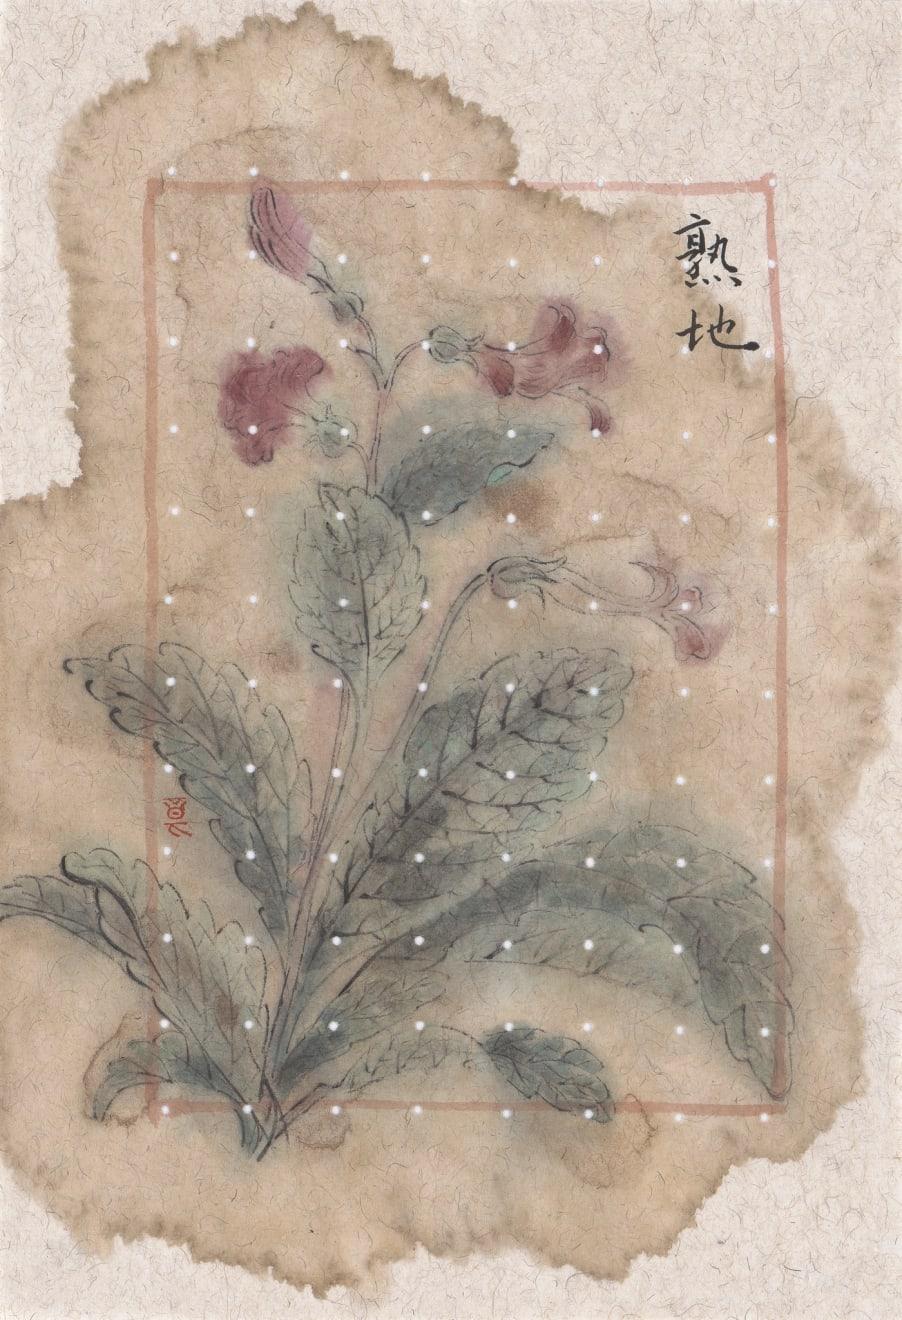 Zhang Yanzi 章燕紫, Six Flavour Rehmanni 六味地黄丸, 2014-2015